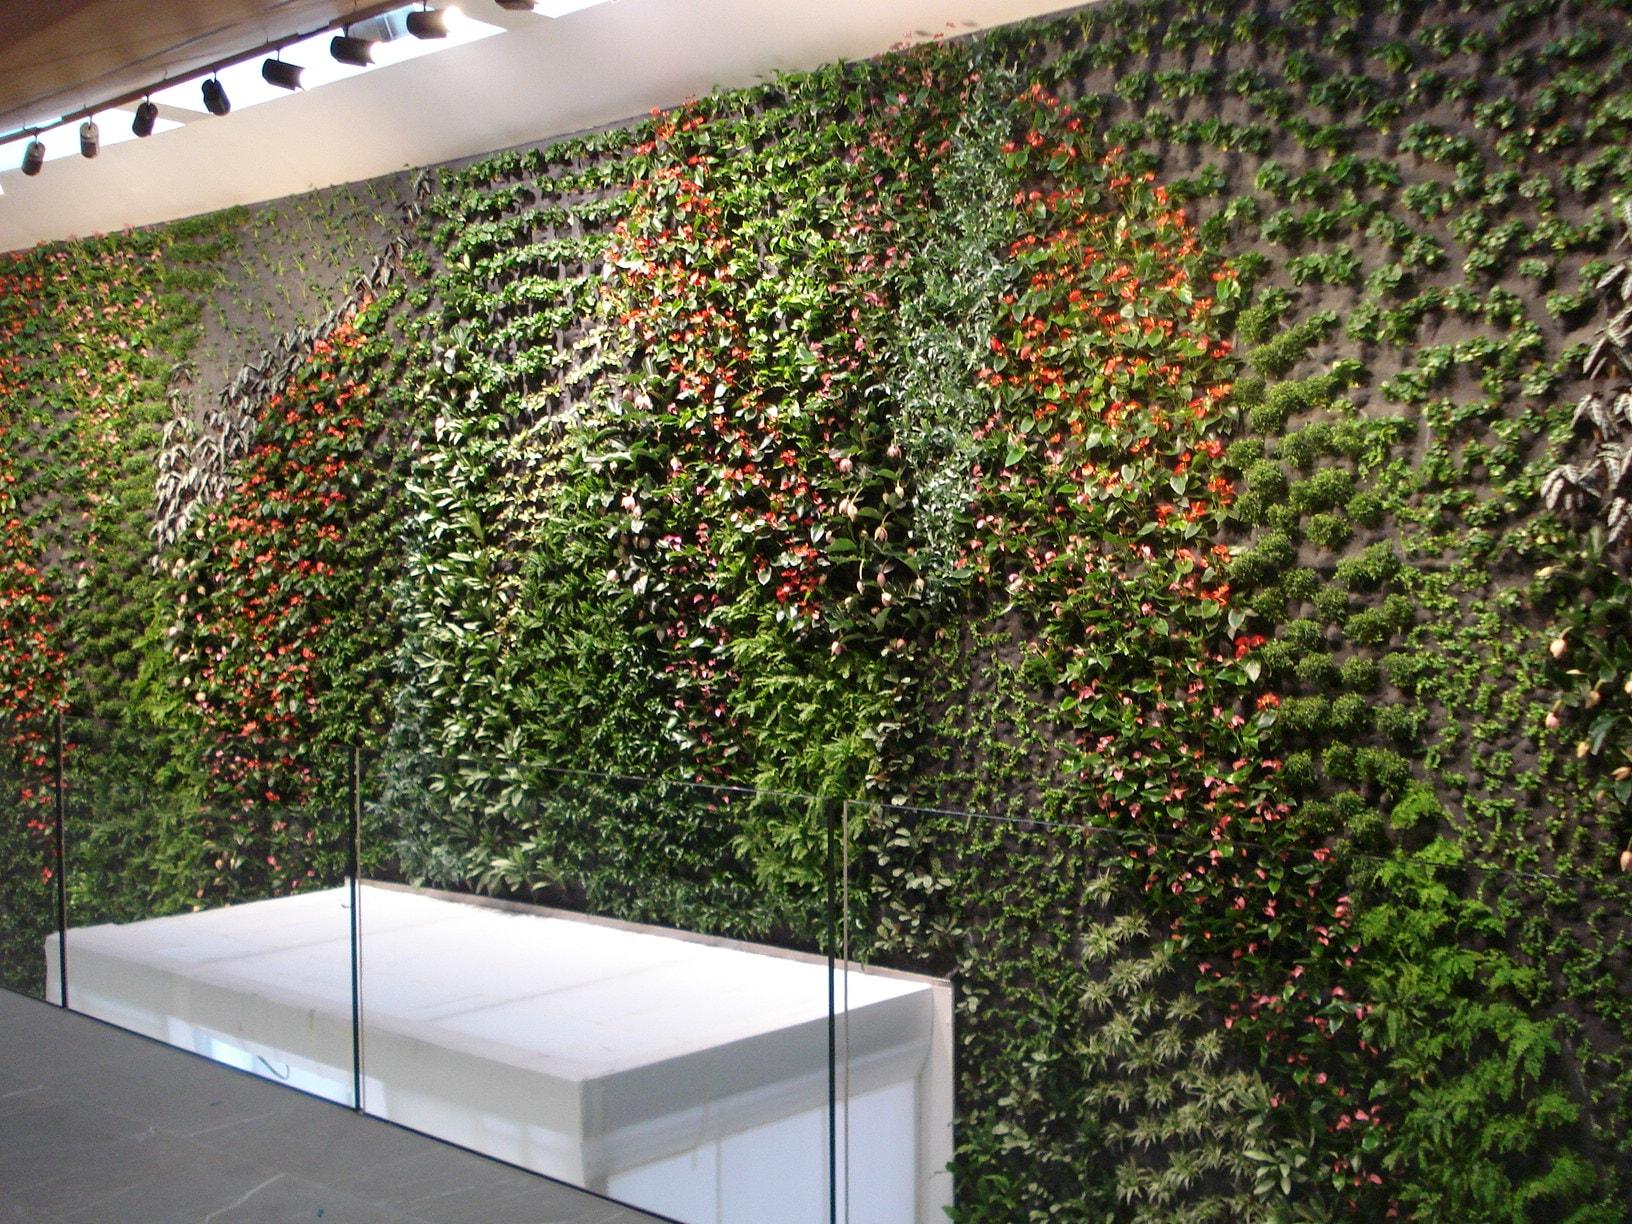 Vertical gardens - Garden design - Quality proposals for your Garden